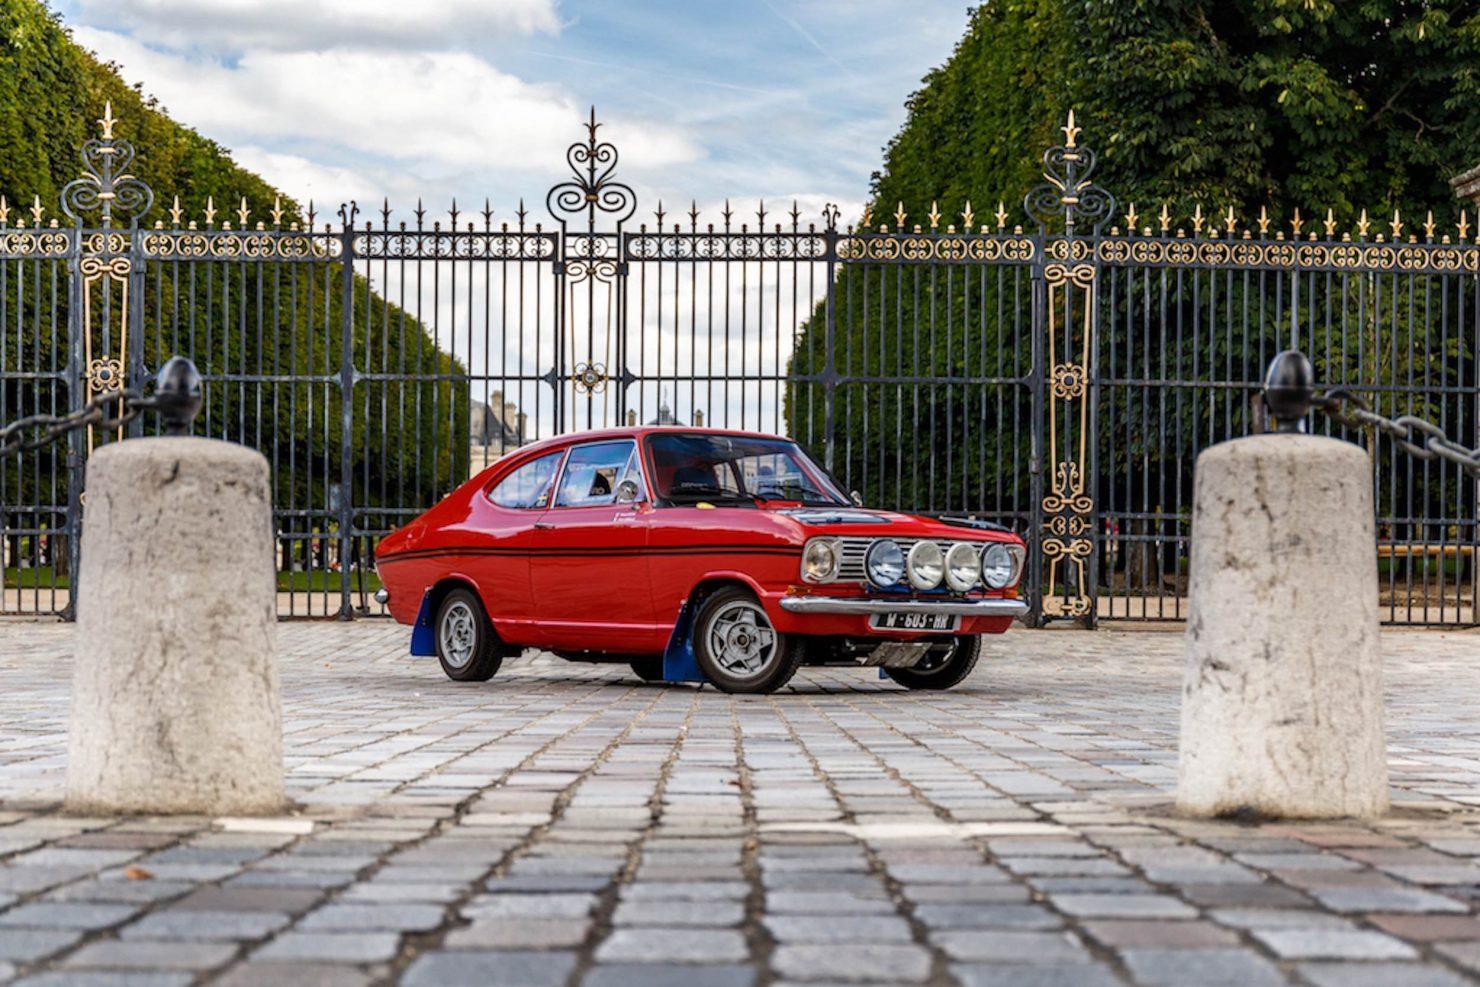 opel kadett rallye car 25 1480x987 - 1969 Opel Rallye Kadett